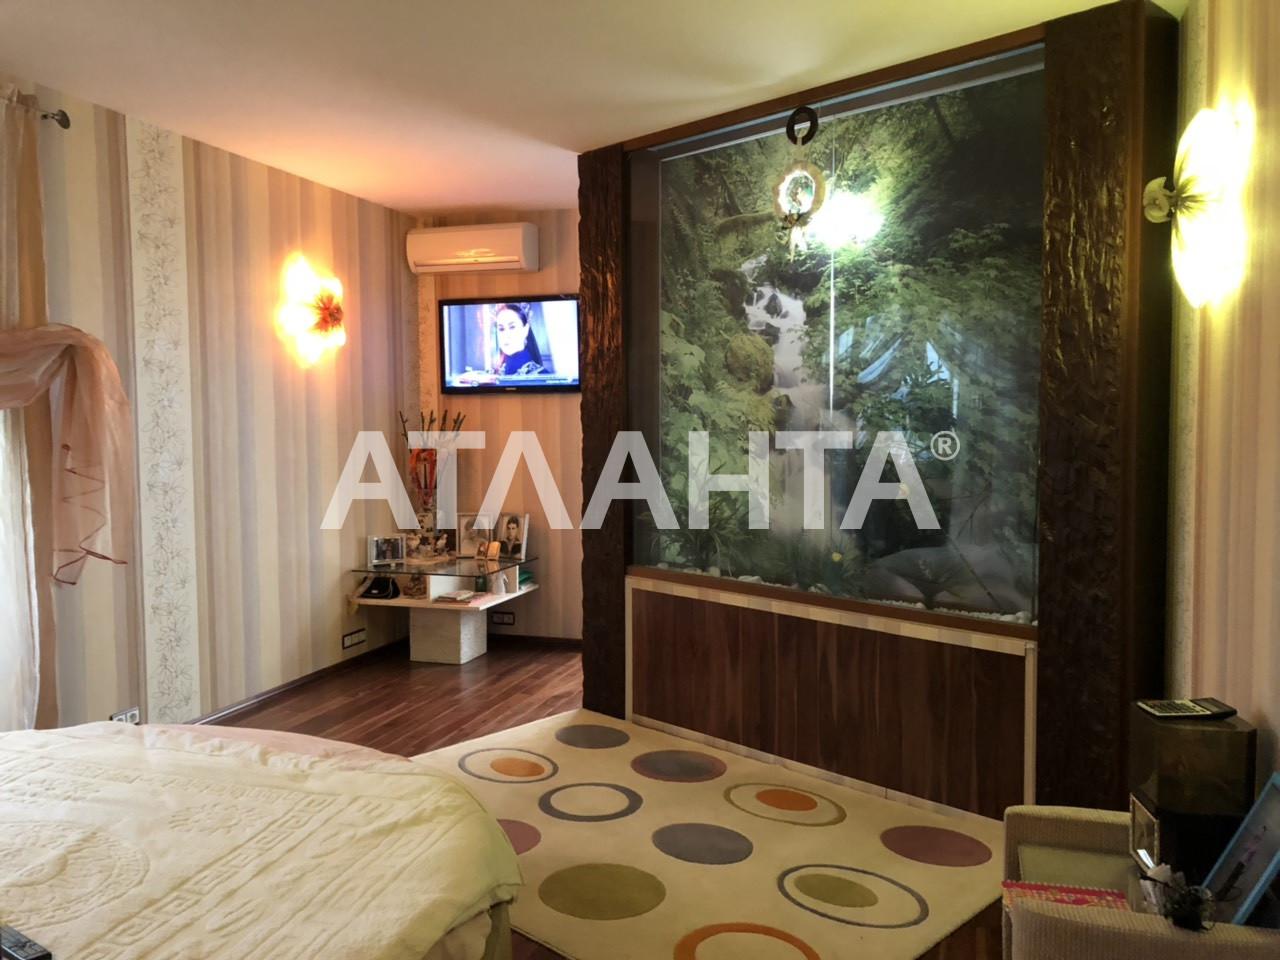 Продается 3-комнатная Квартира на ул. 1 Мая — 135 000 у.е. (фото №19)